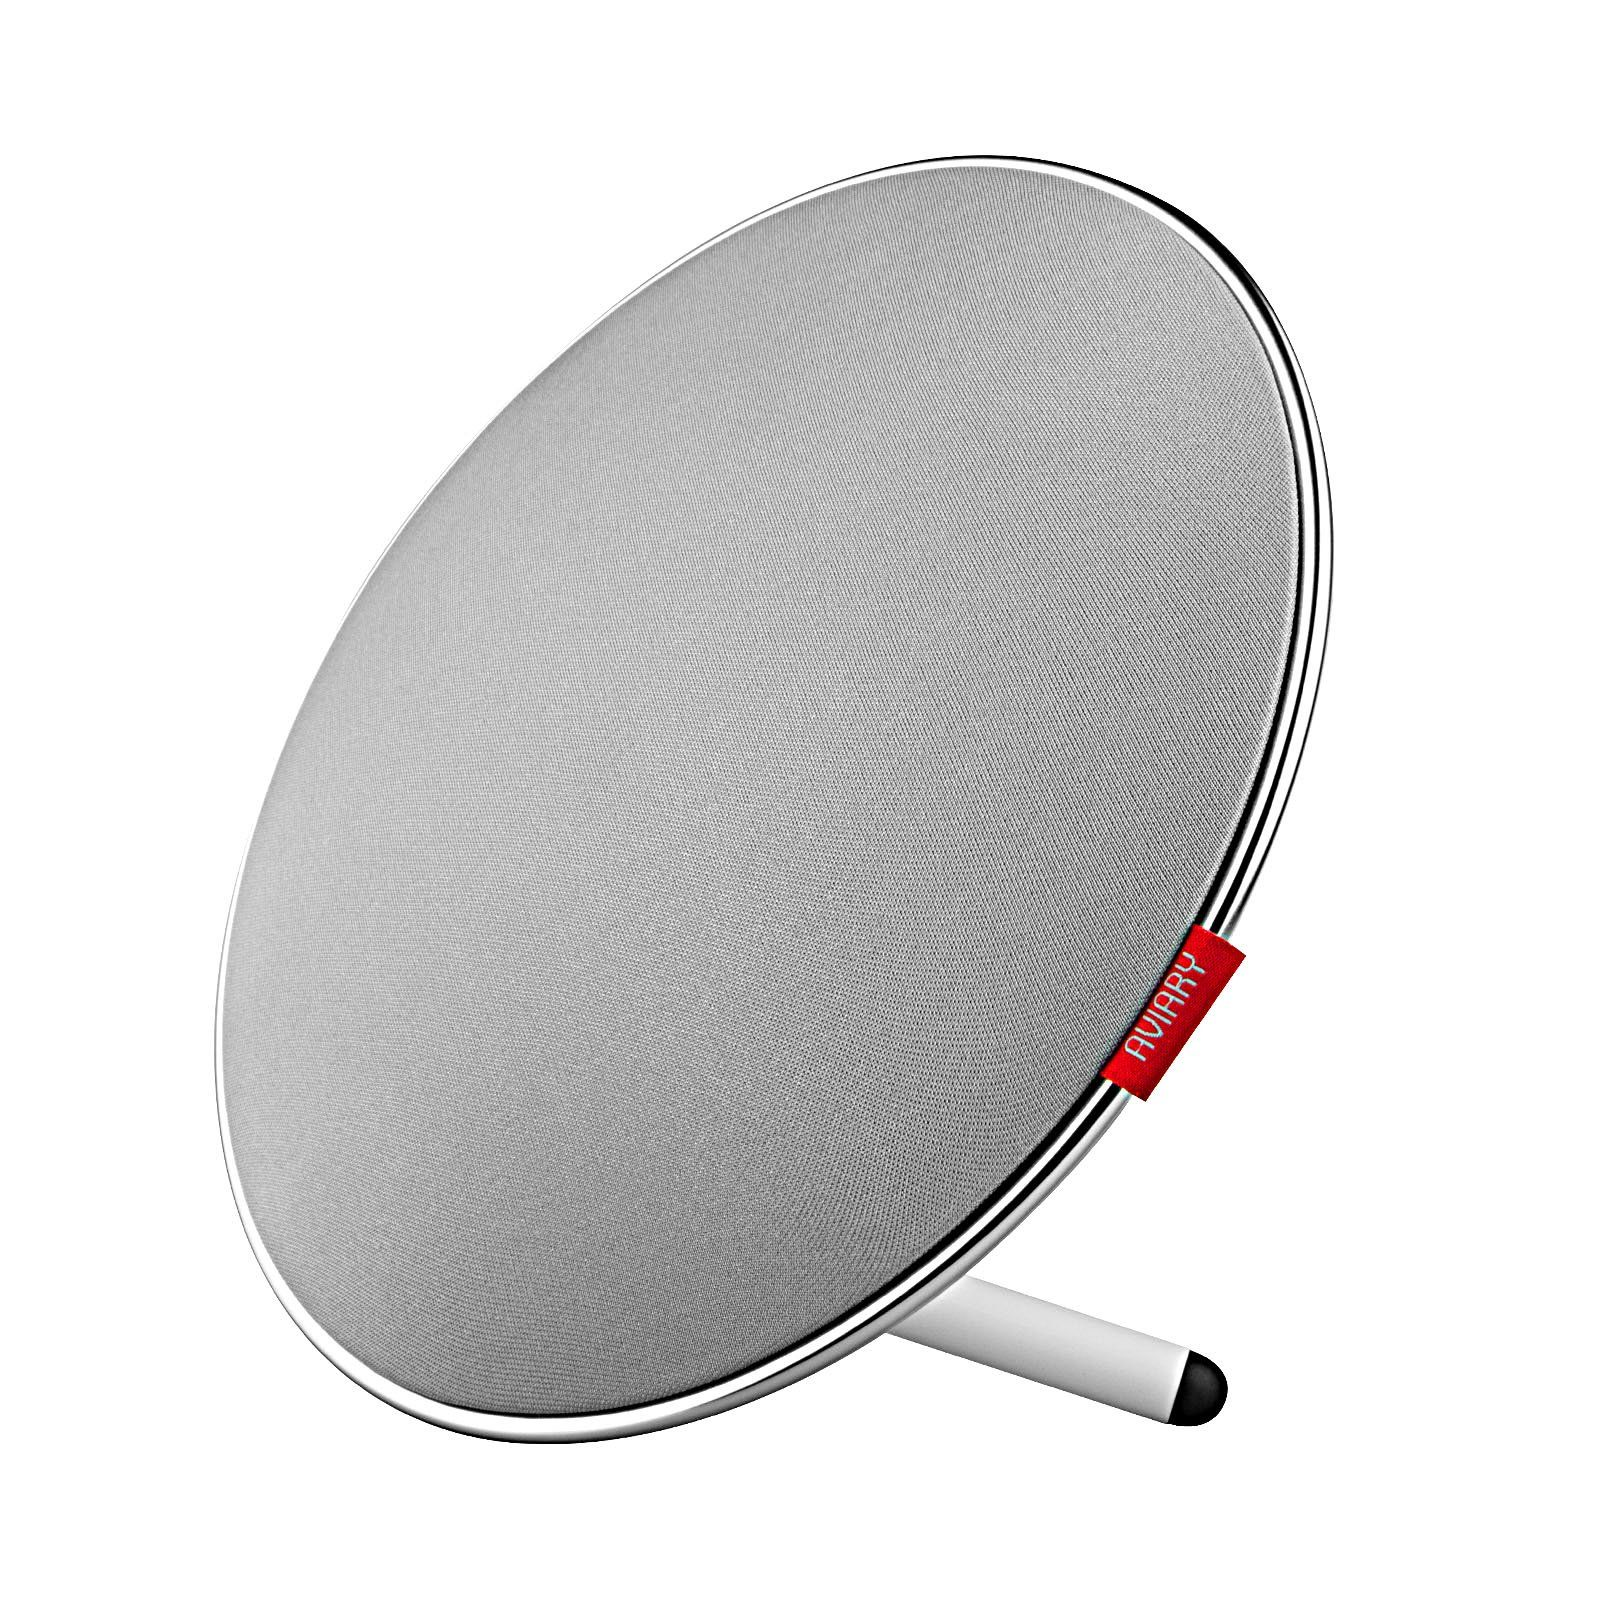 Owlee AVIARY Portable Wireless Bluetooth Speaker W Two